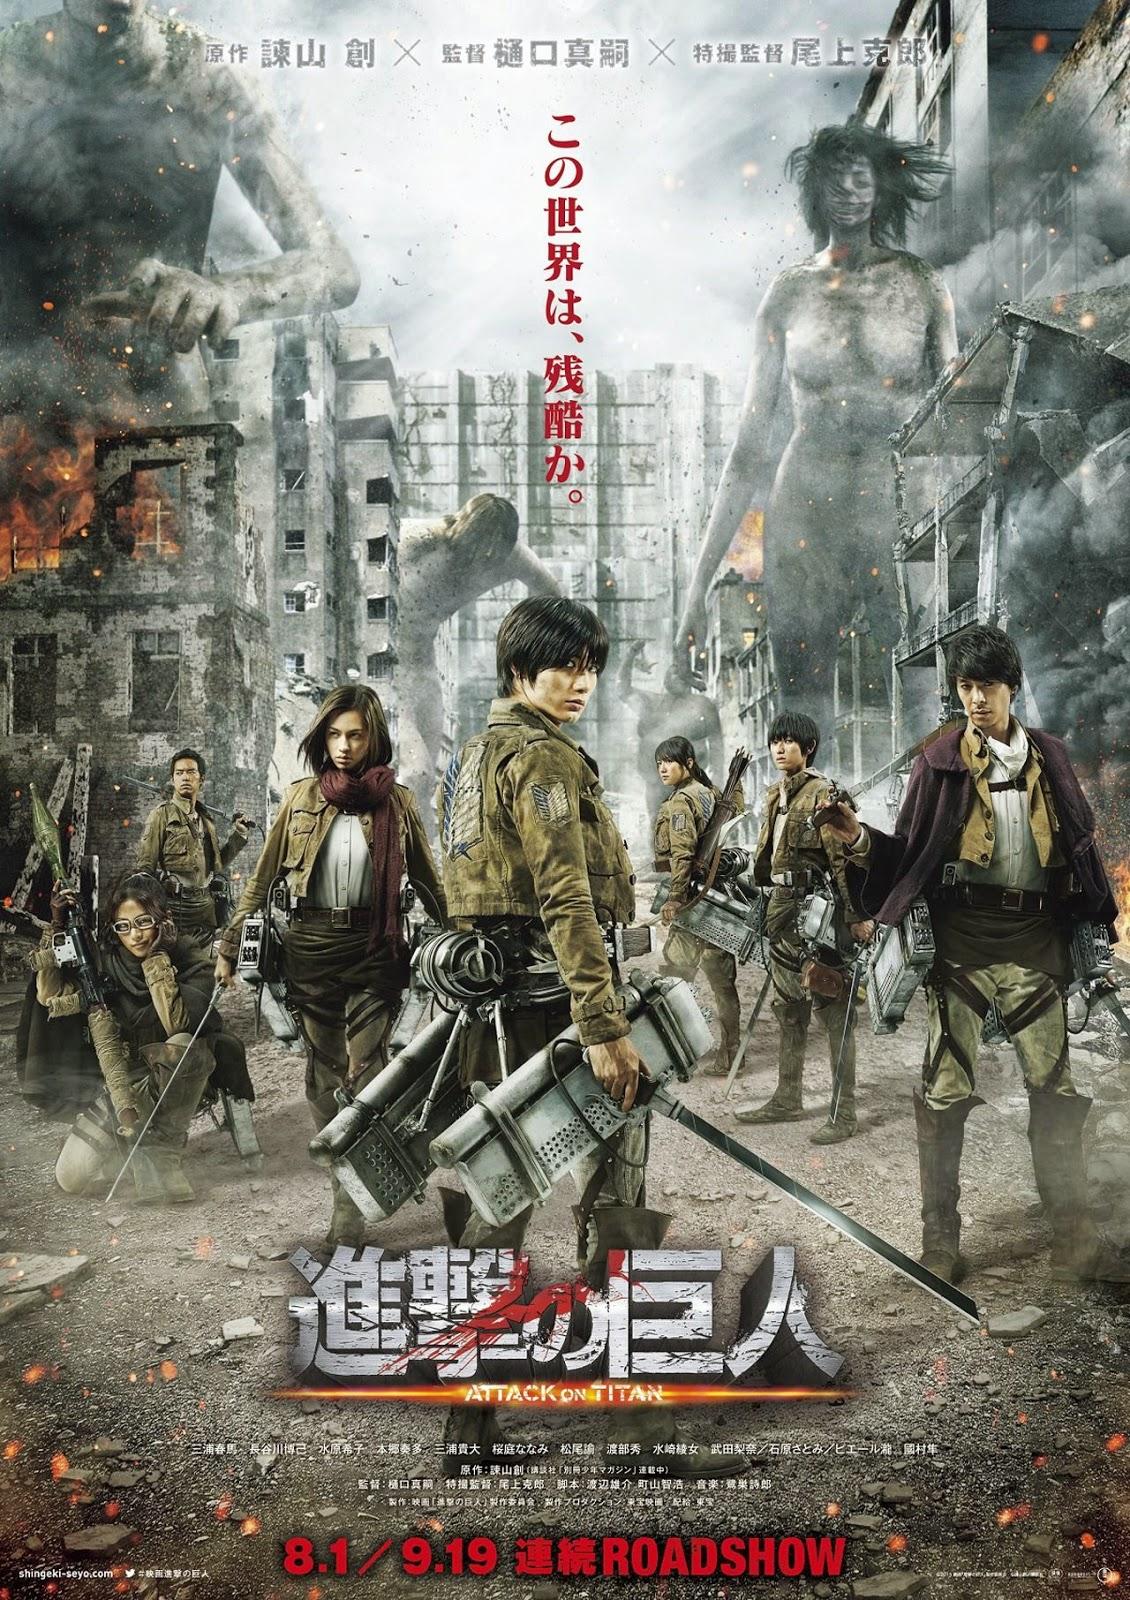 Attack on titan (2015) ผ่าพิภพไททัน เดอะมูฟวี่ [HD]